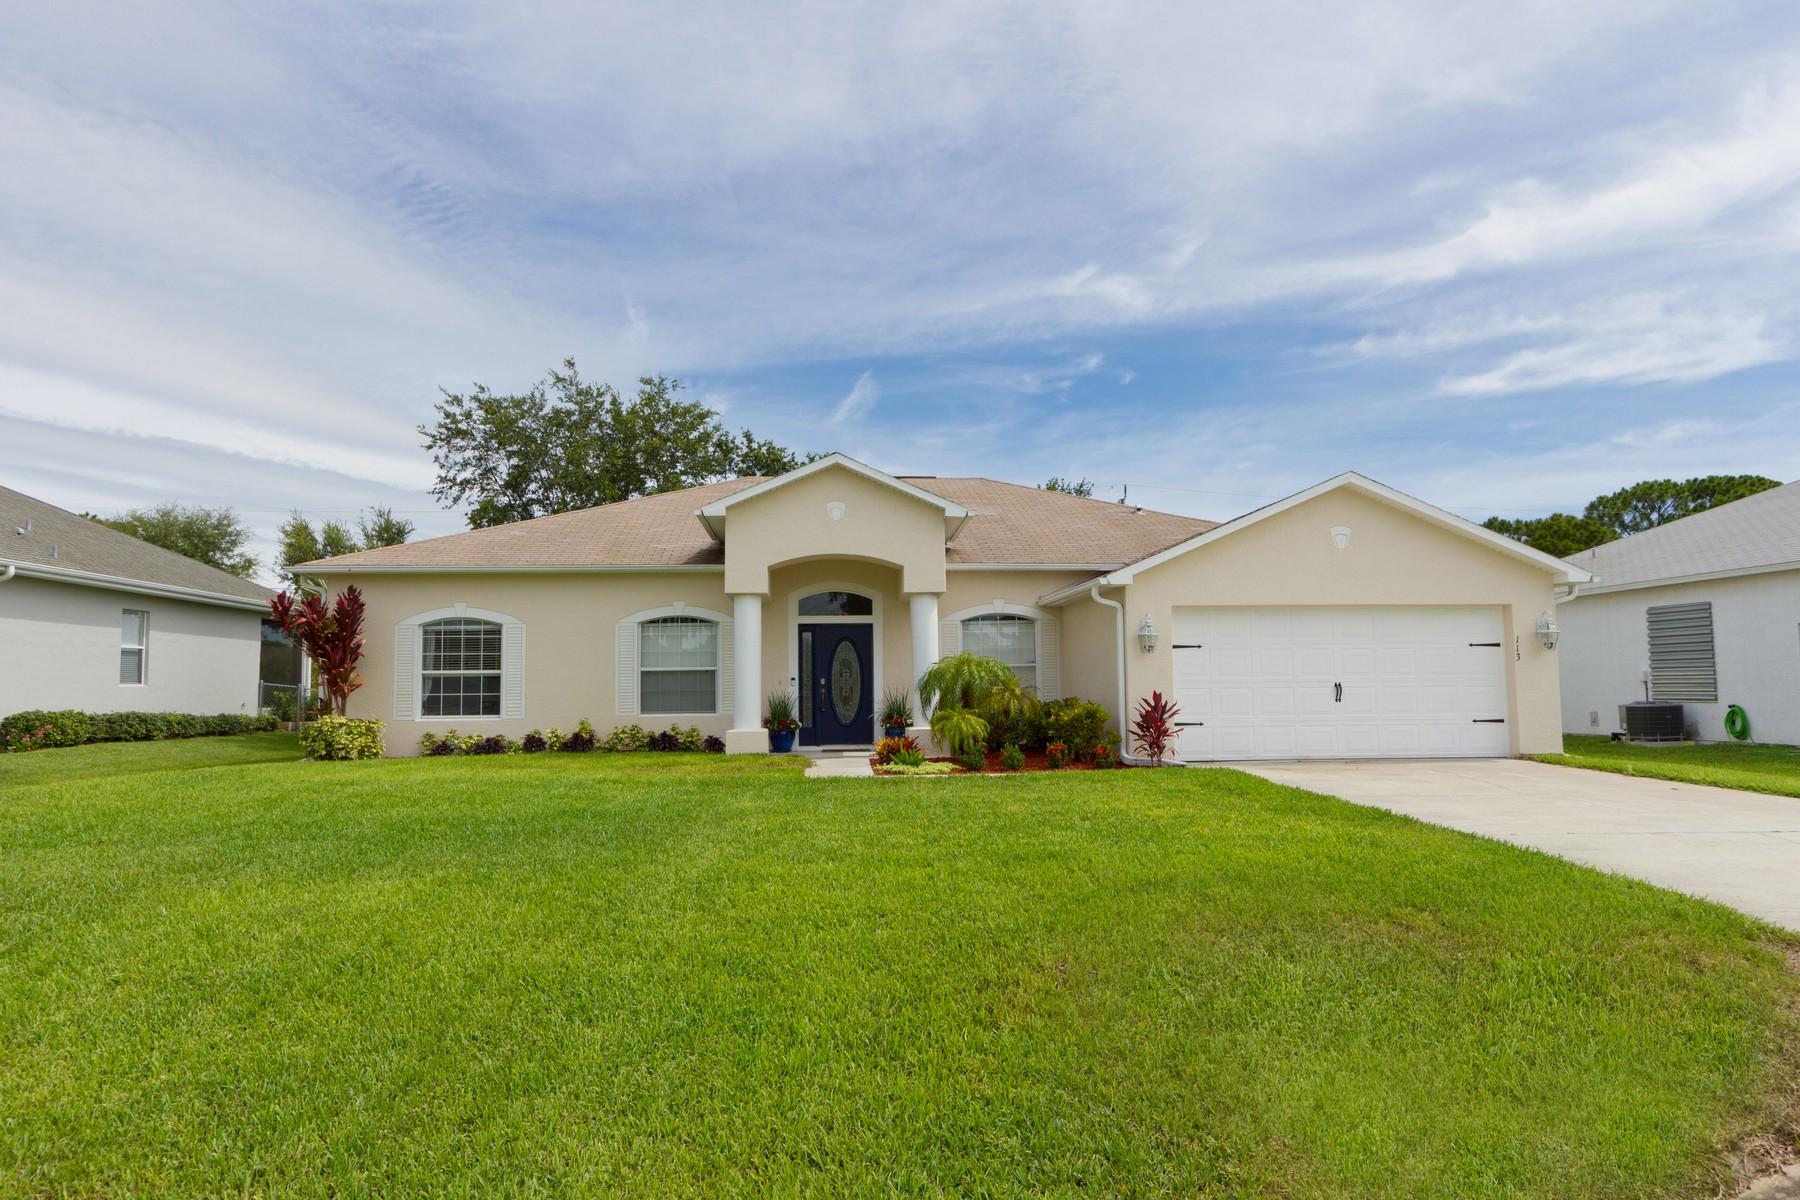 Property for Sale at Charming One Story Sebastian Home 113 Empire Terrace Sebastian, Florida 32958 United States